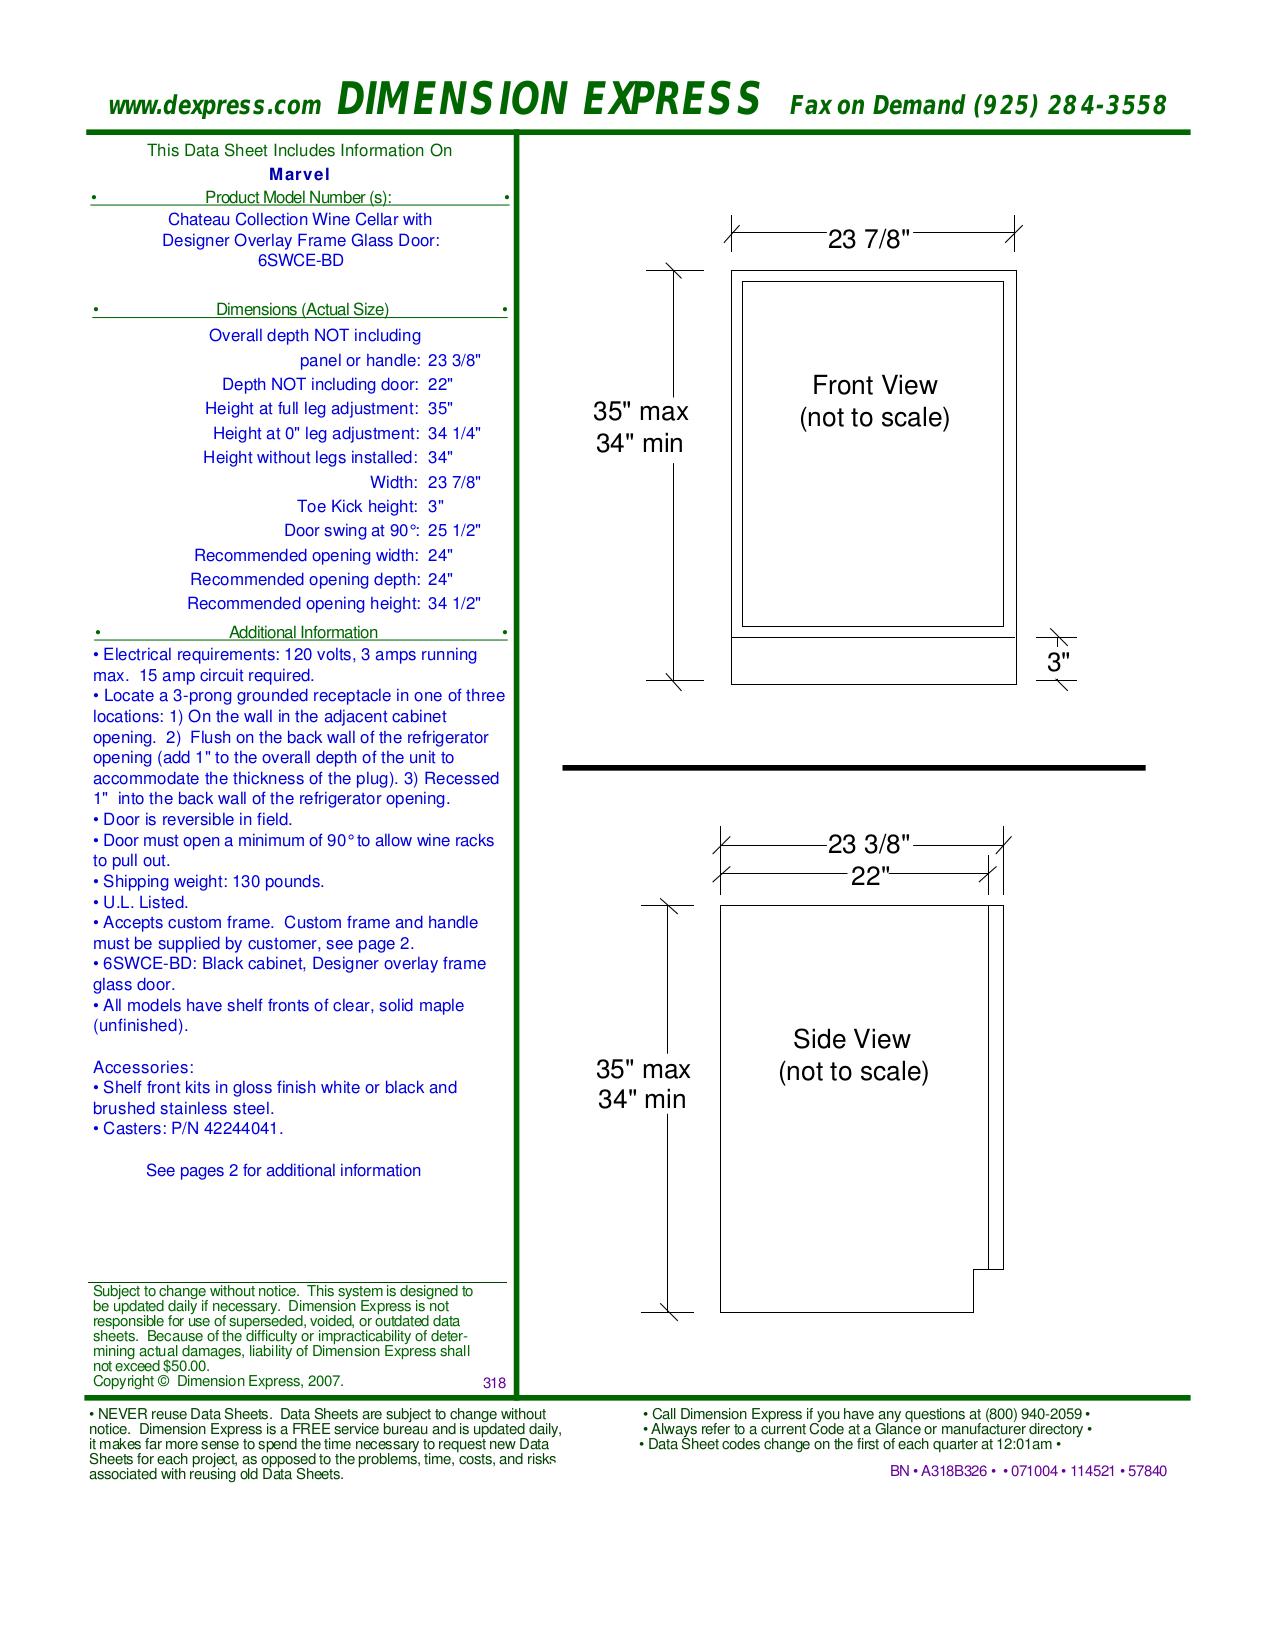 pdf for Marvel Refrigerator 6SWCE-BD manual